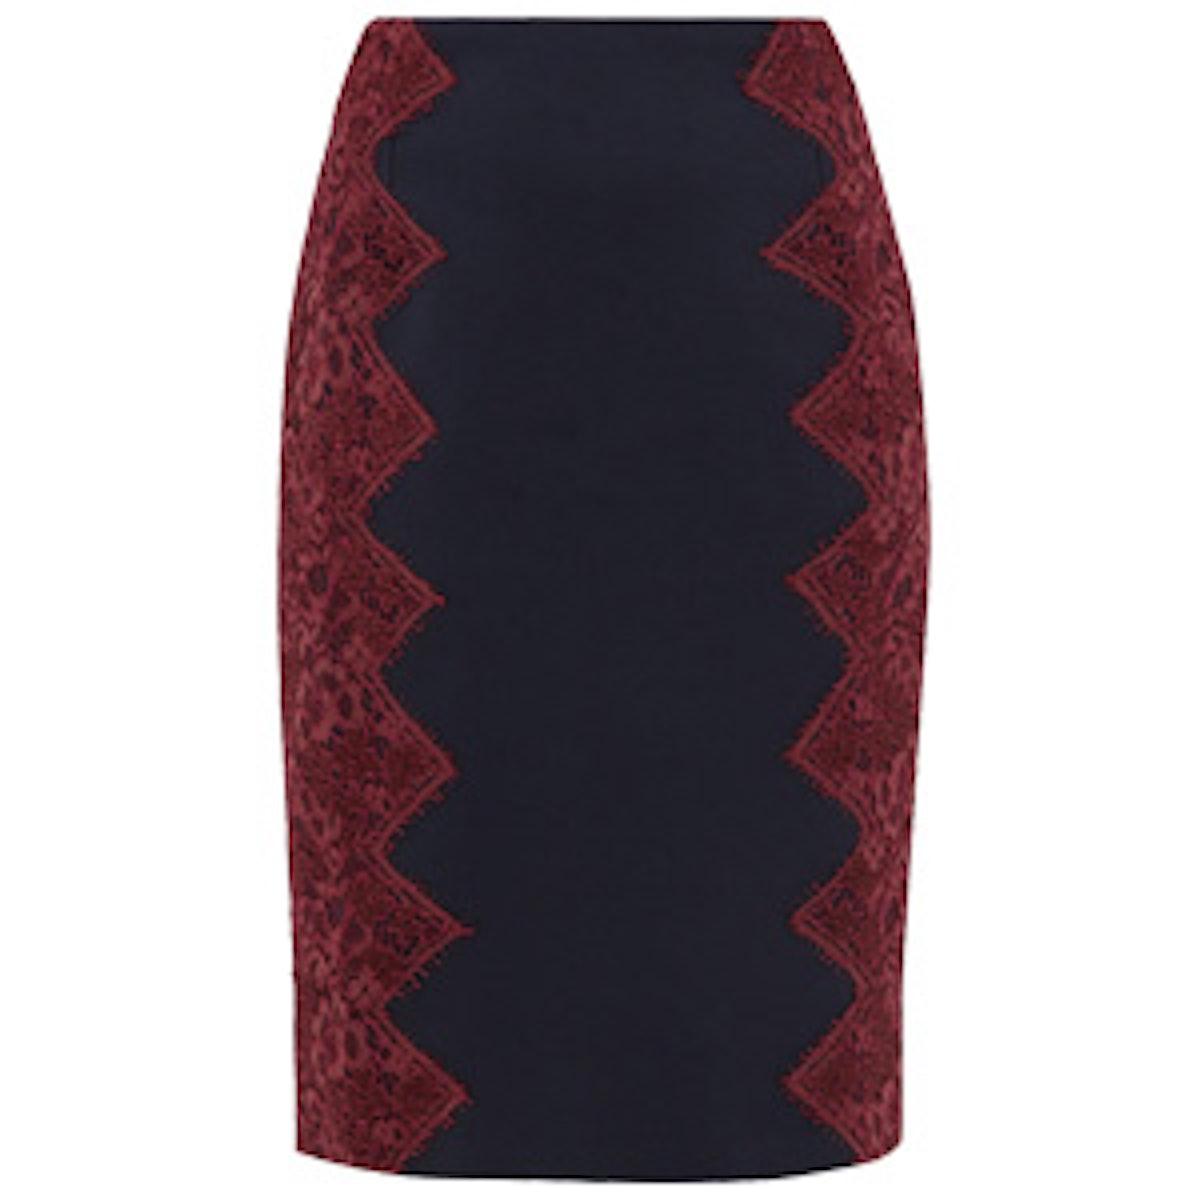 Scallop Lace Pencil Skirt